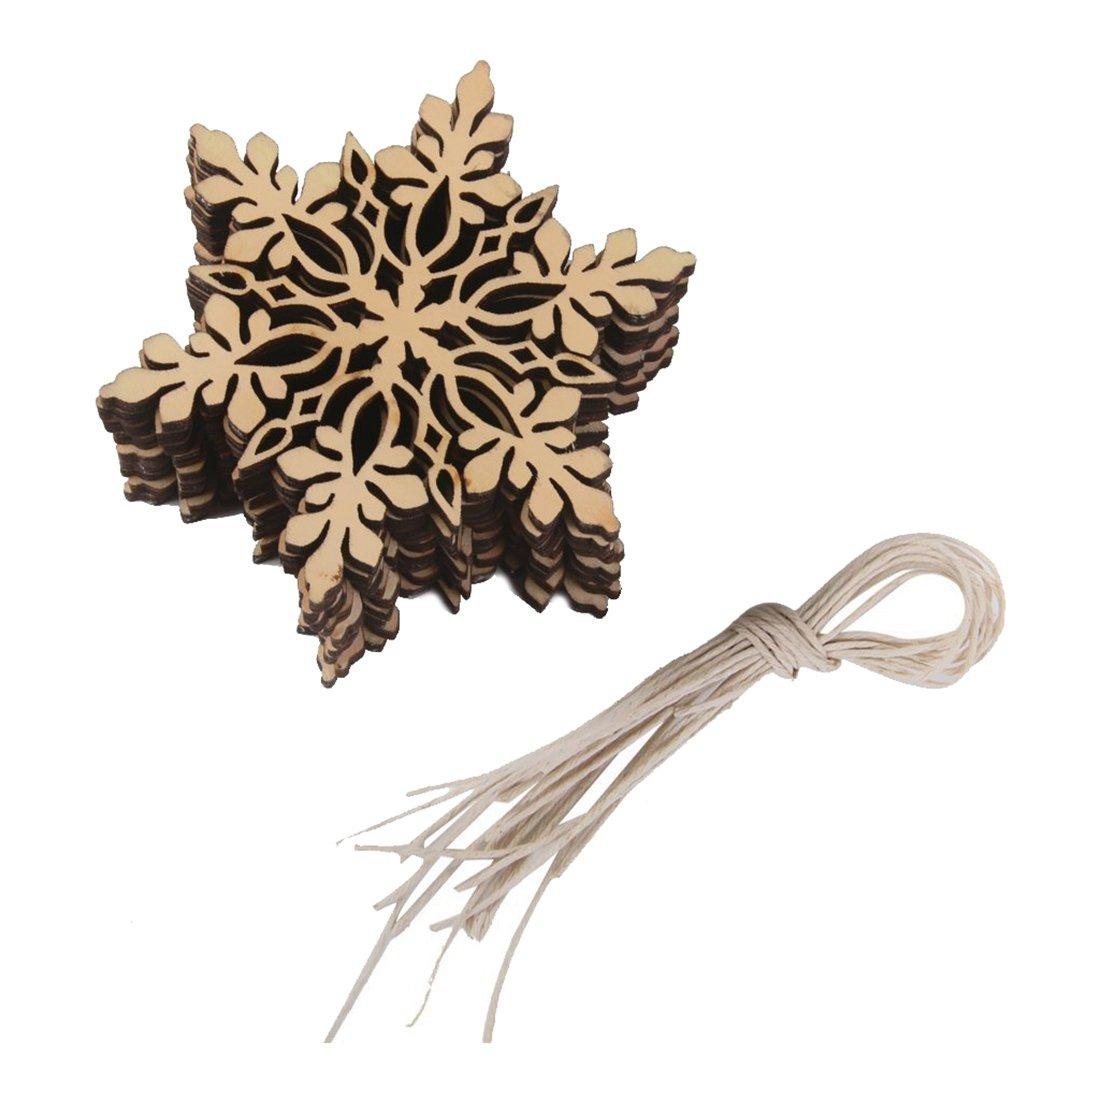 SODIAL(R) 10 pcs. Sharp hexagonal wood snowflake ornament Christmas tree decor W. String